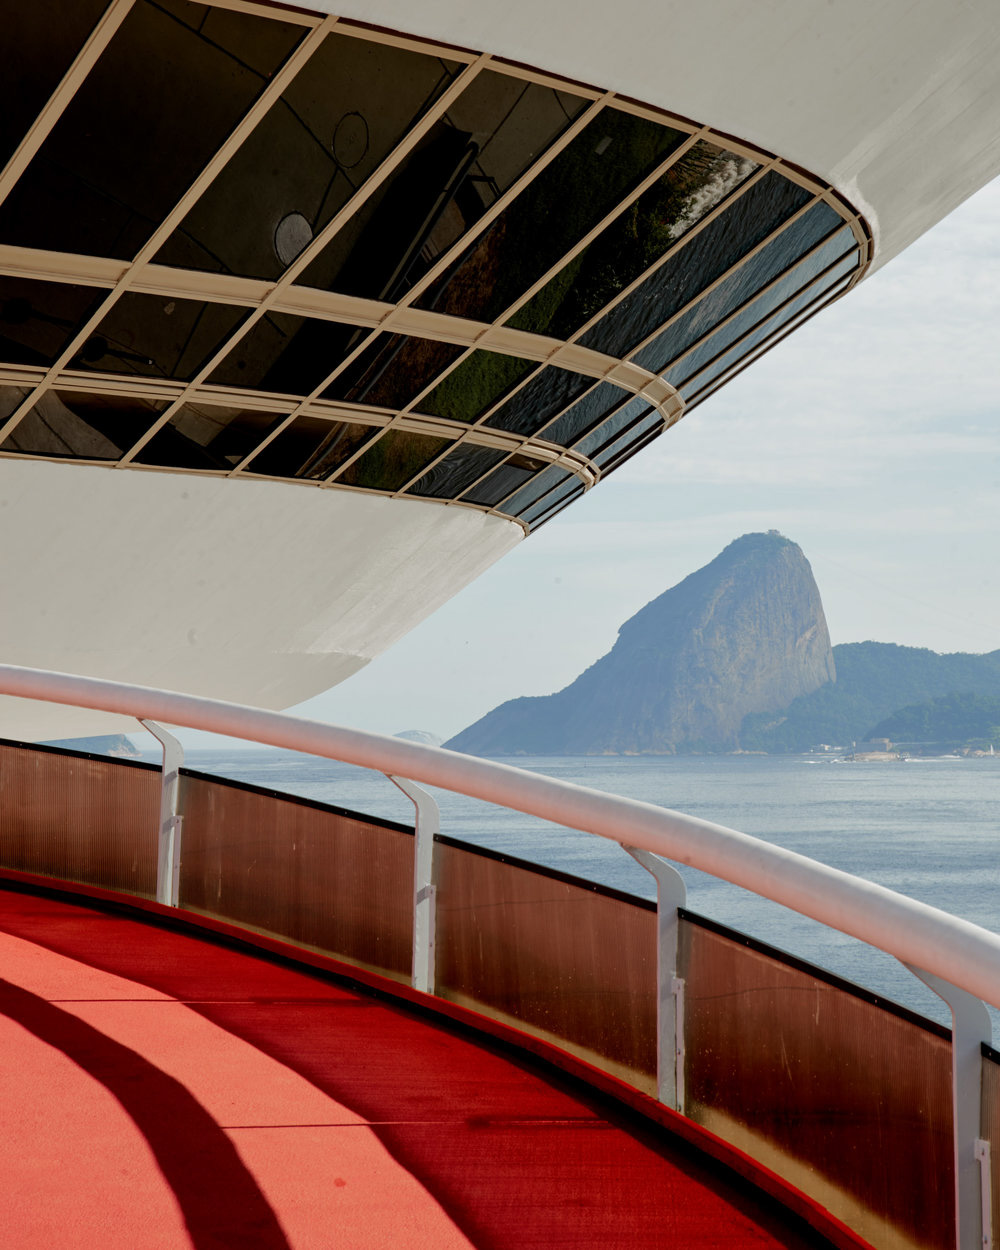 Niterói Contemporary Art Museum designed by Oscar Niemeyer in Rio de Janeiro, Brazil